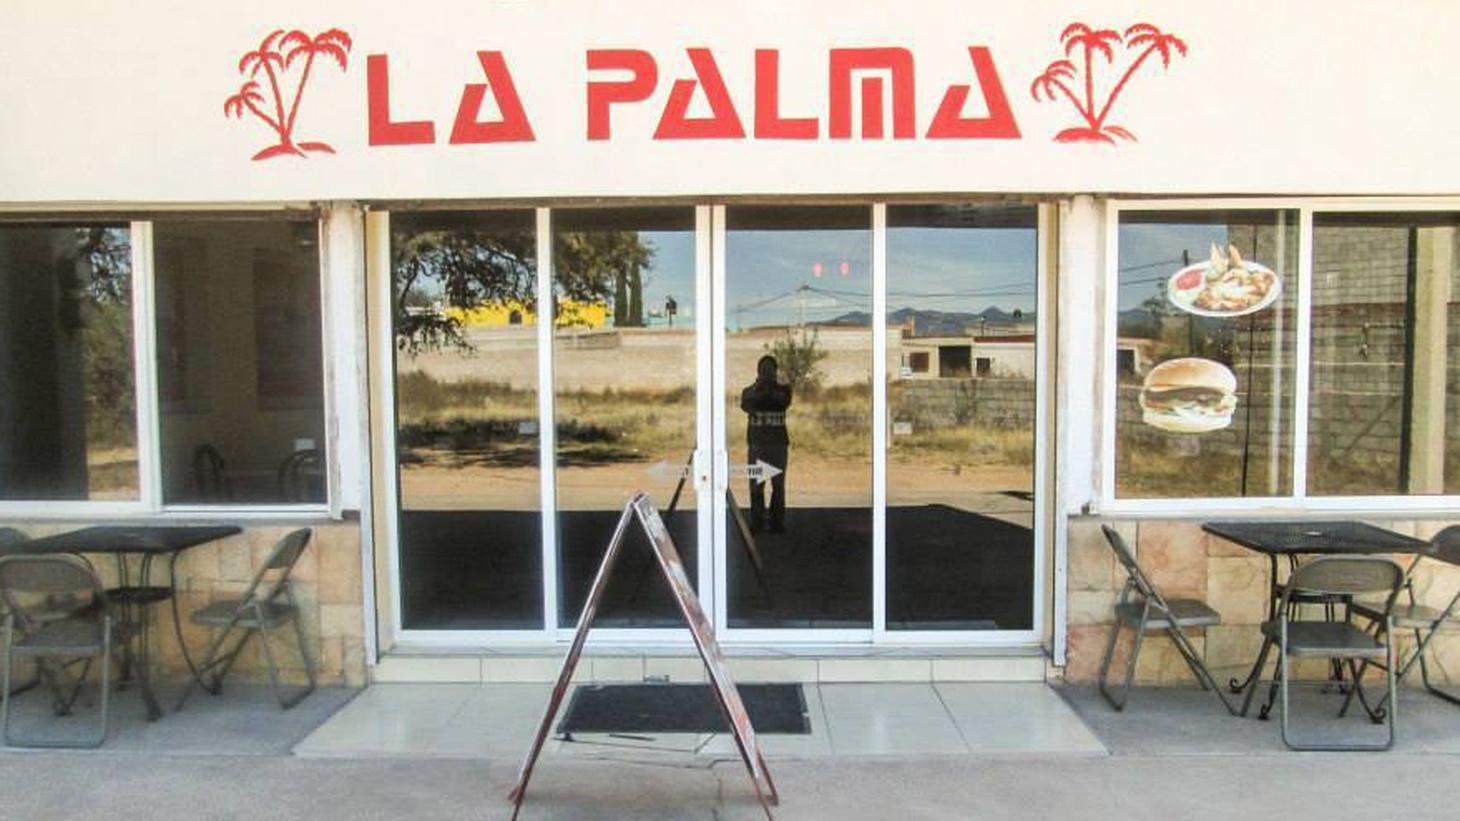 Pulitzer Prize-winning food writer Jonathan Gold reviews Burritos La Palma, a taqueria in El Monte.